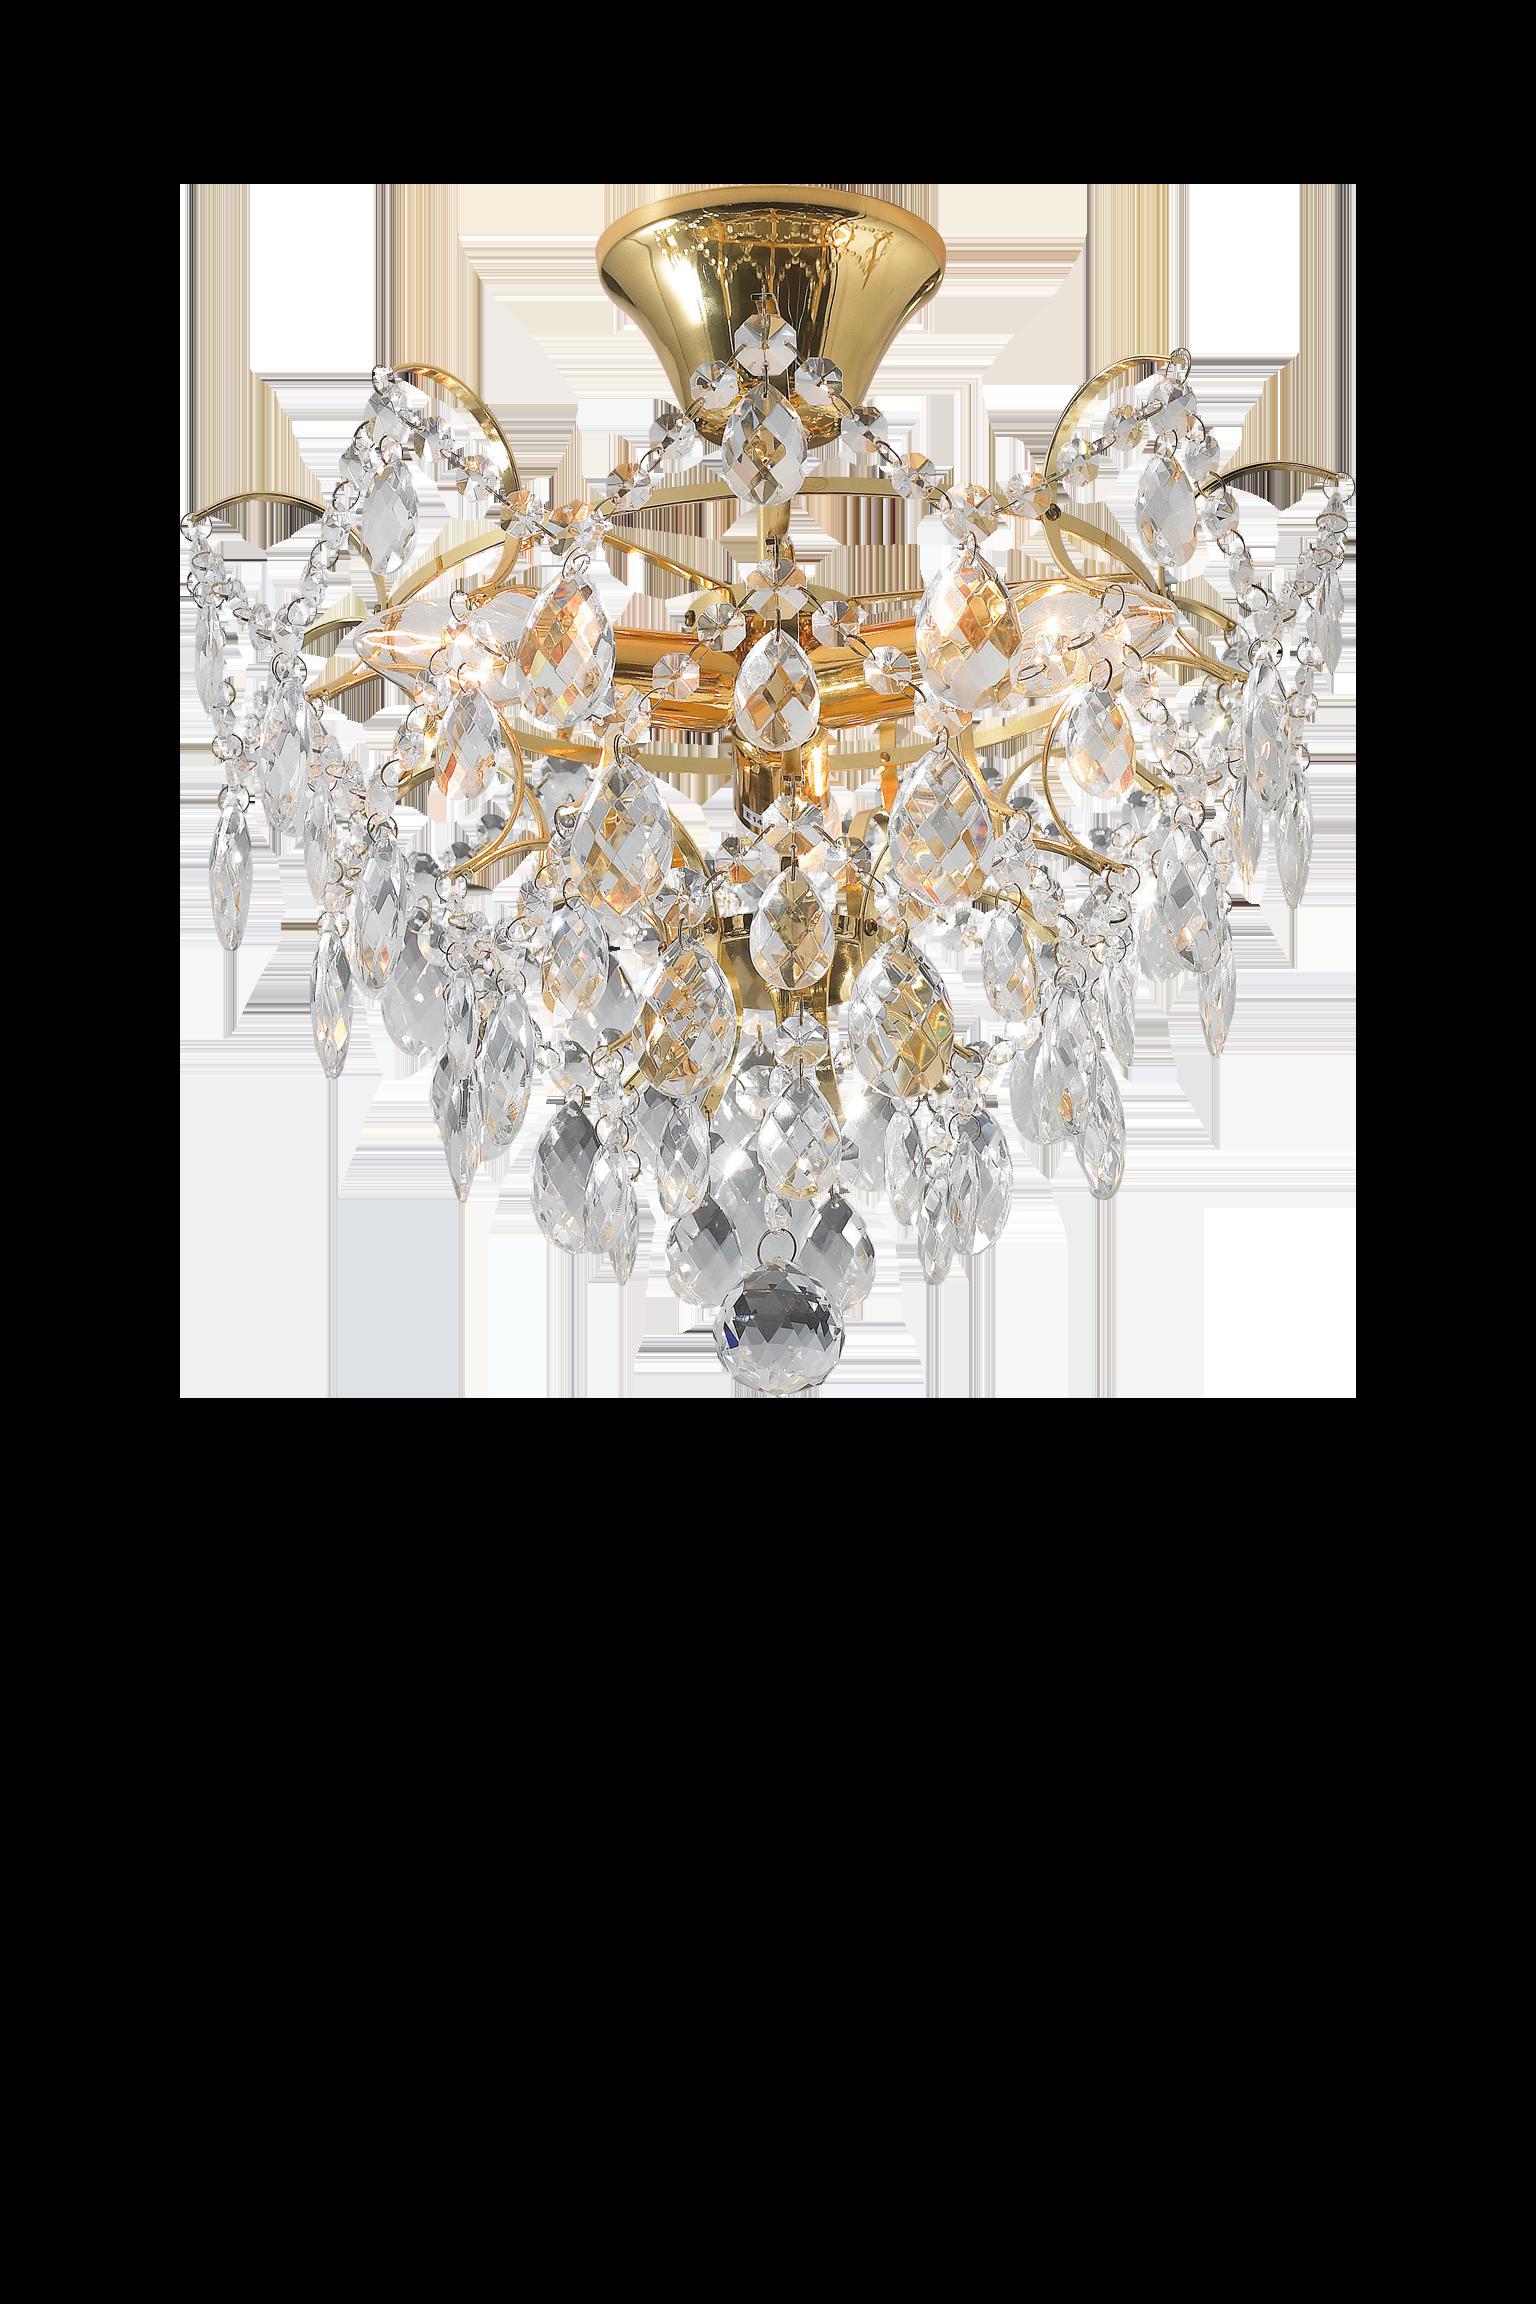 ROSENDAL - Plafond Gold